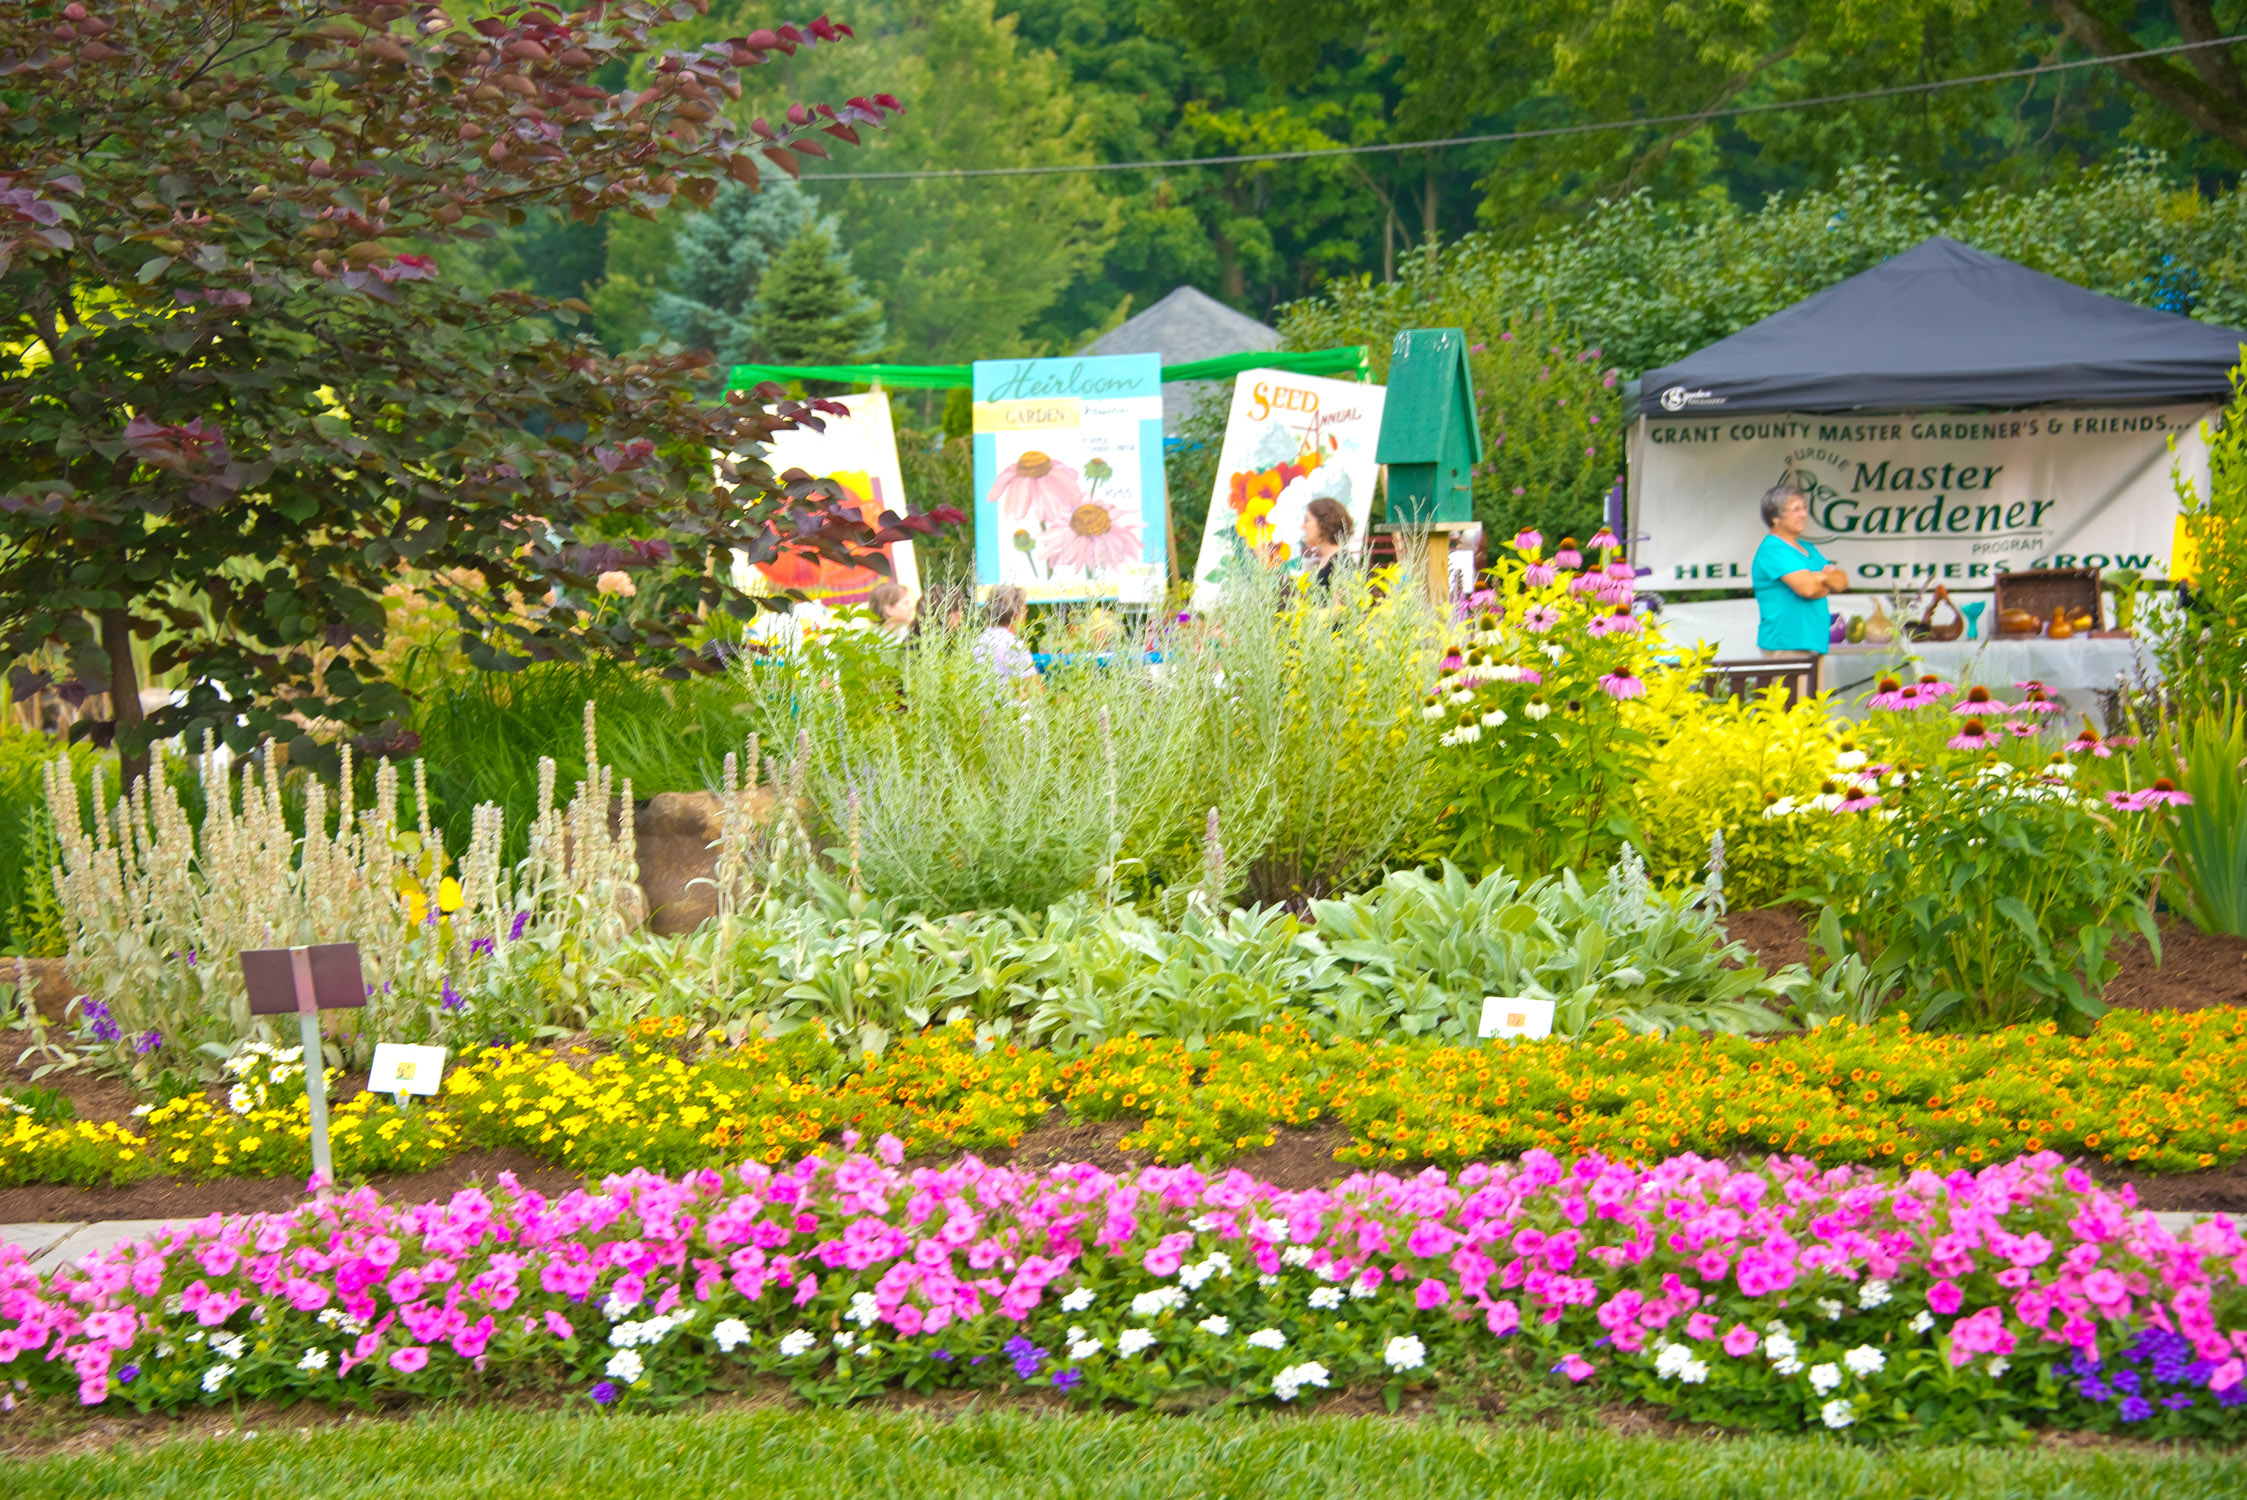 GardenEvent_Photos_Tiffany_042.jpg